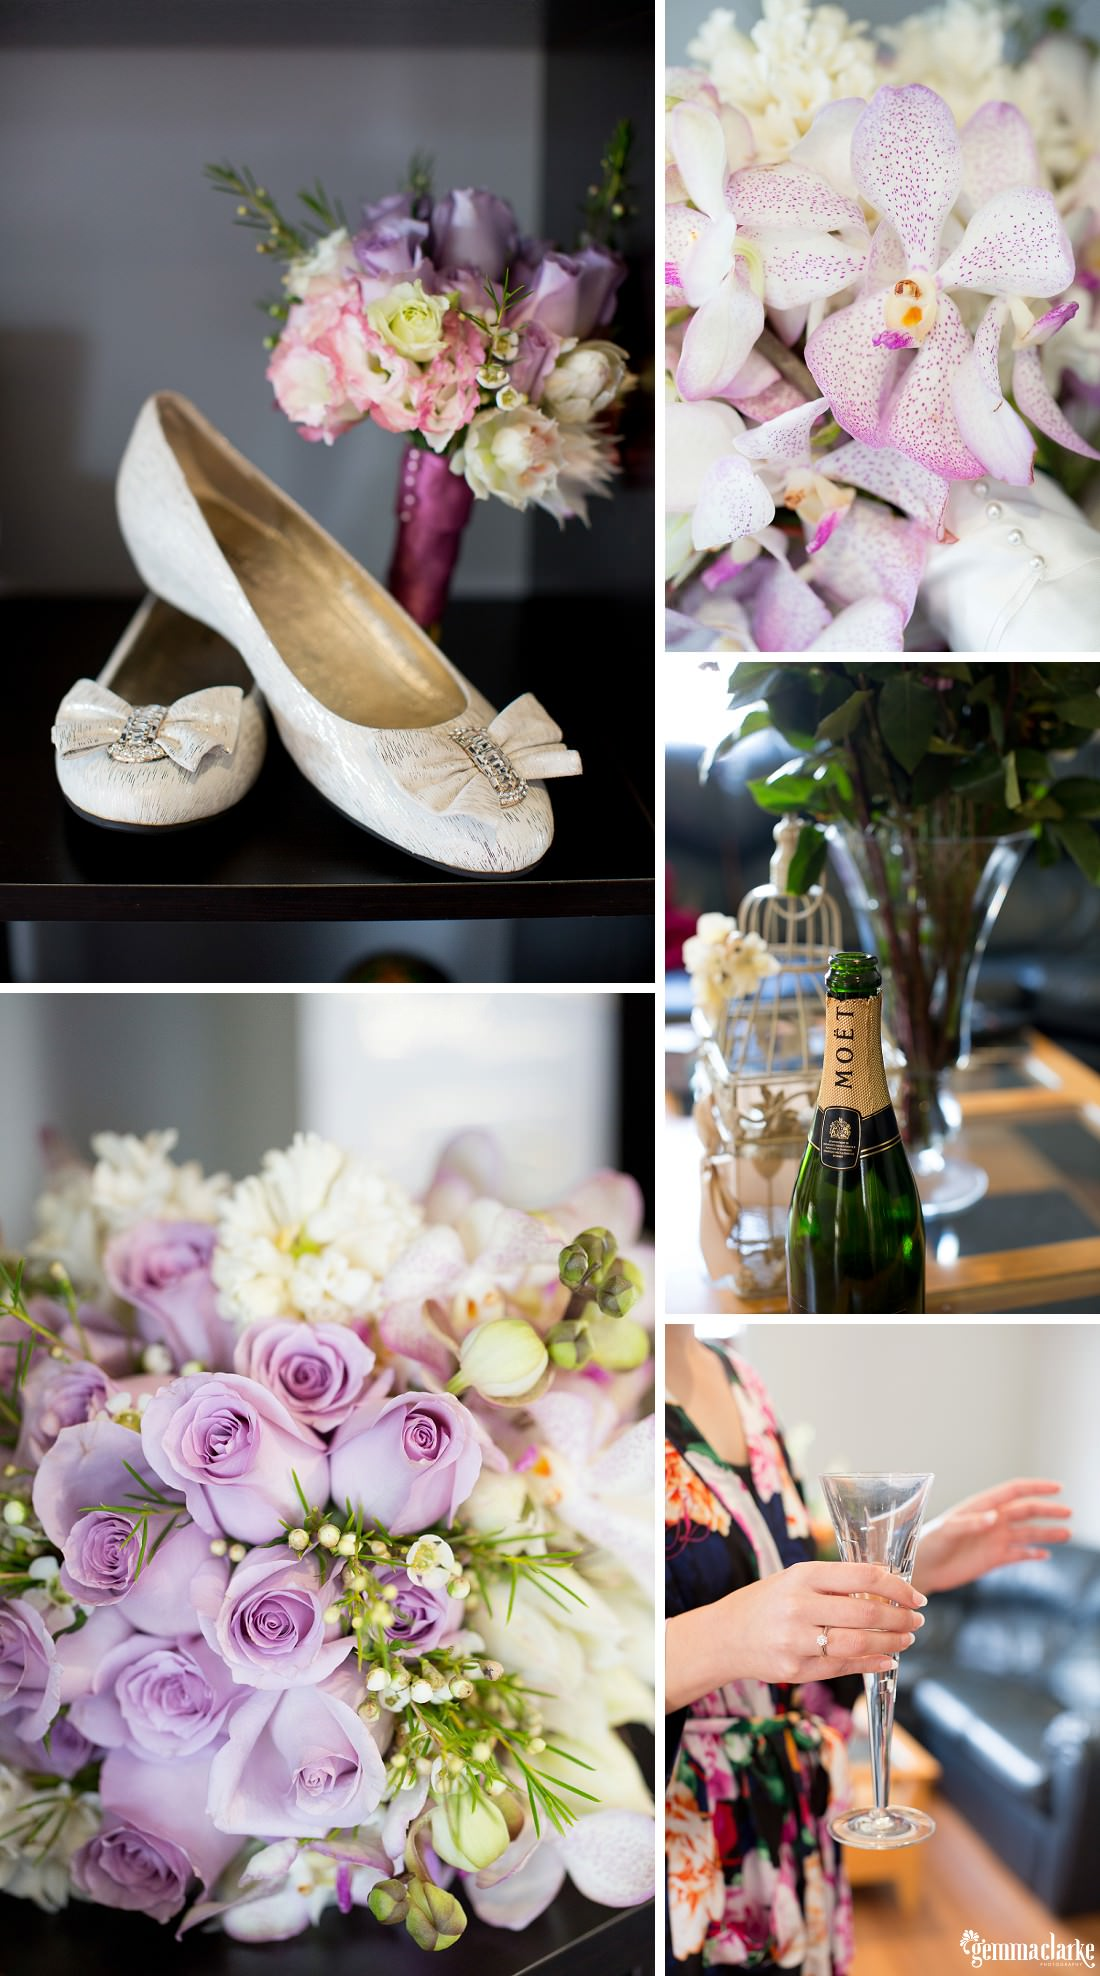 gemma-clarke-photography_deckhouse-woolwich-wedding_clarkes-point-reserve-wedding_natalie-and-chris_0003